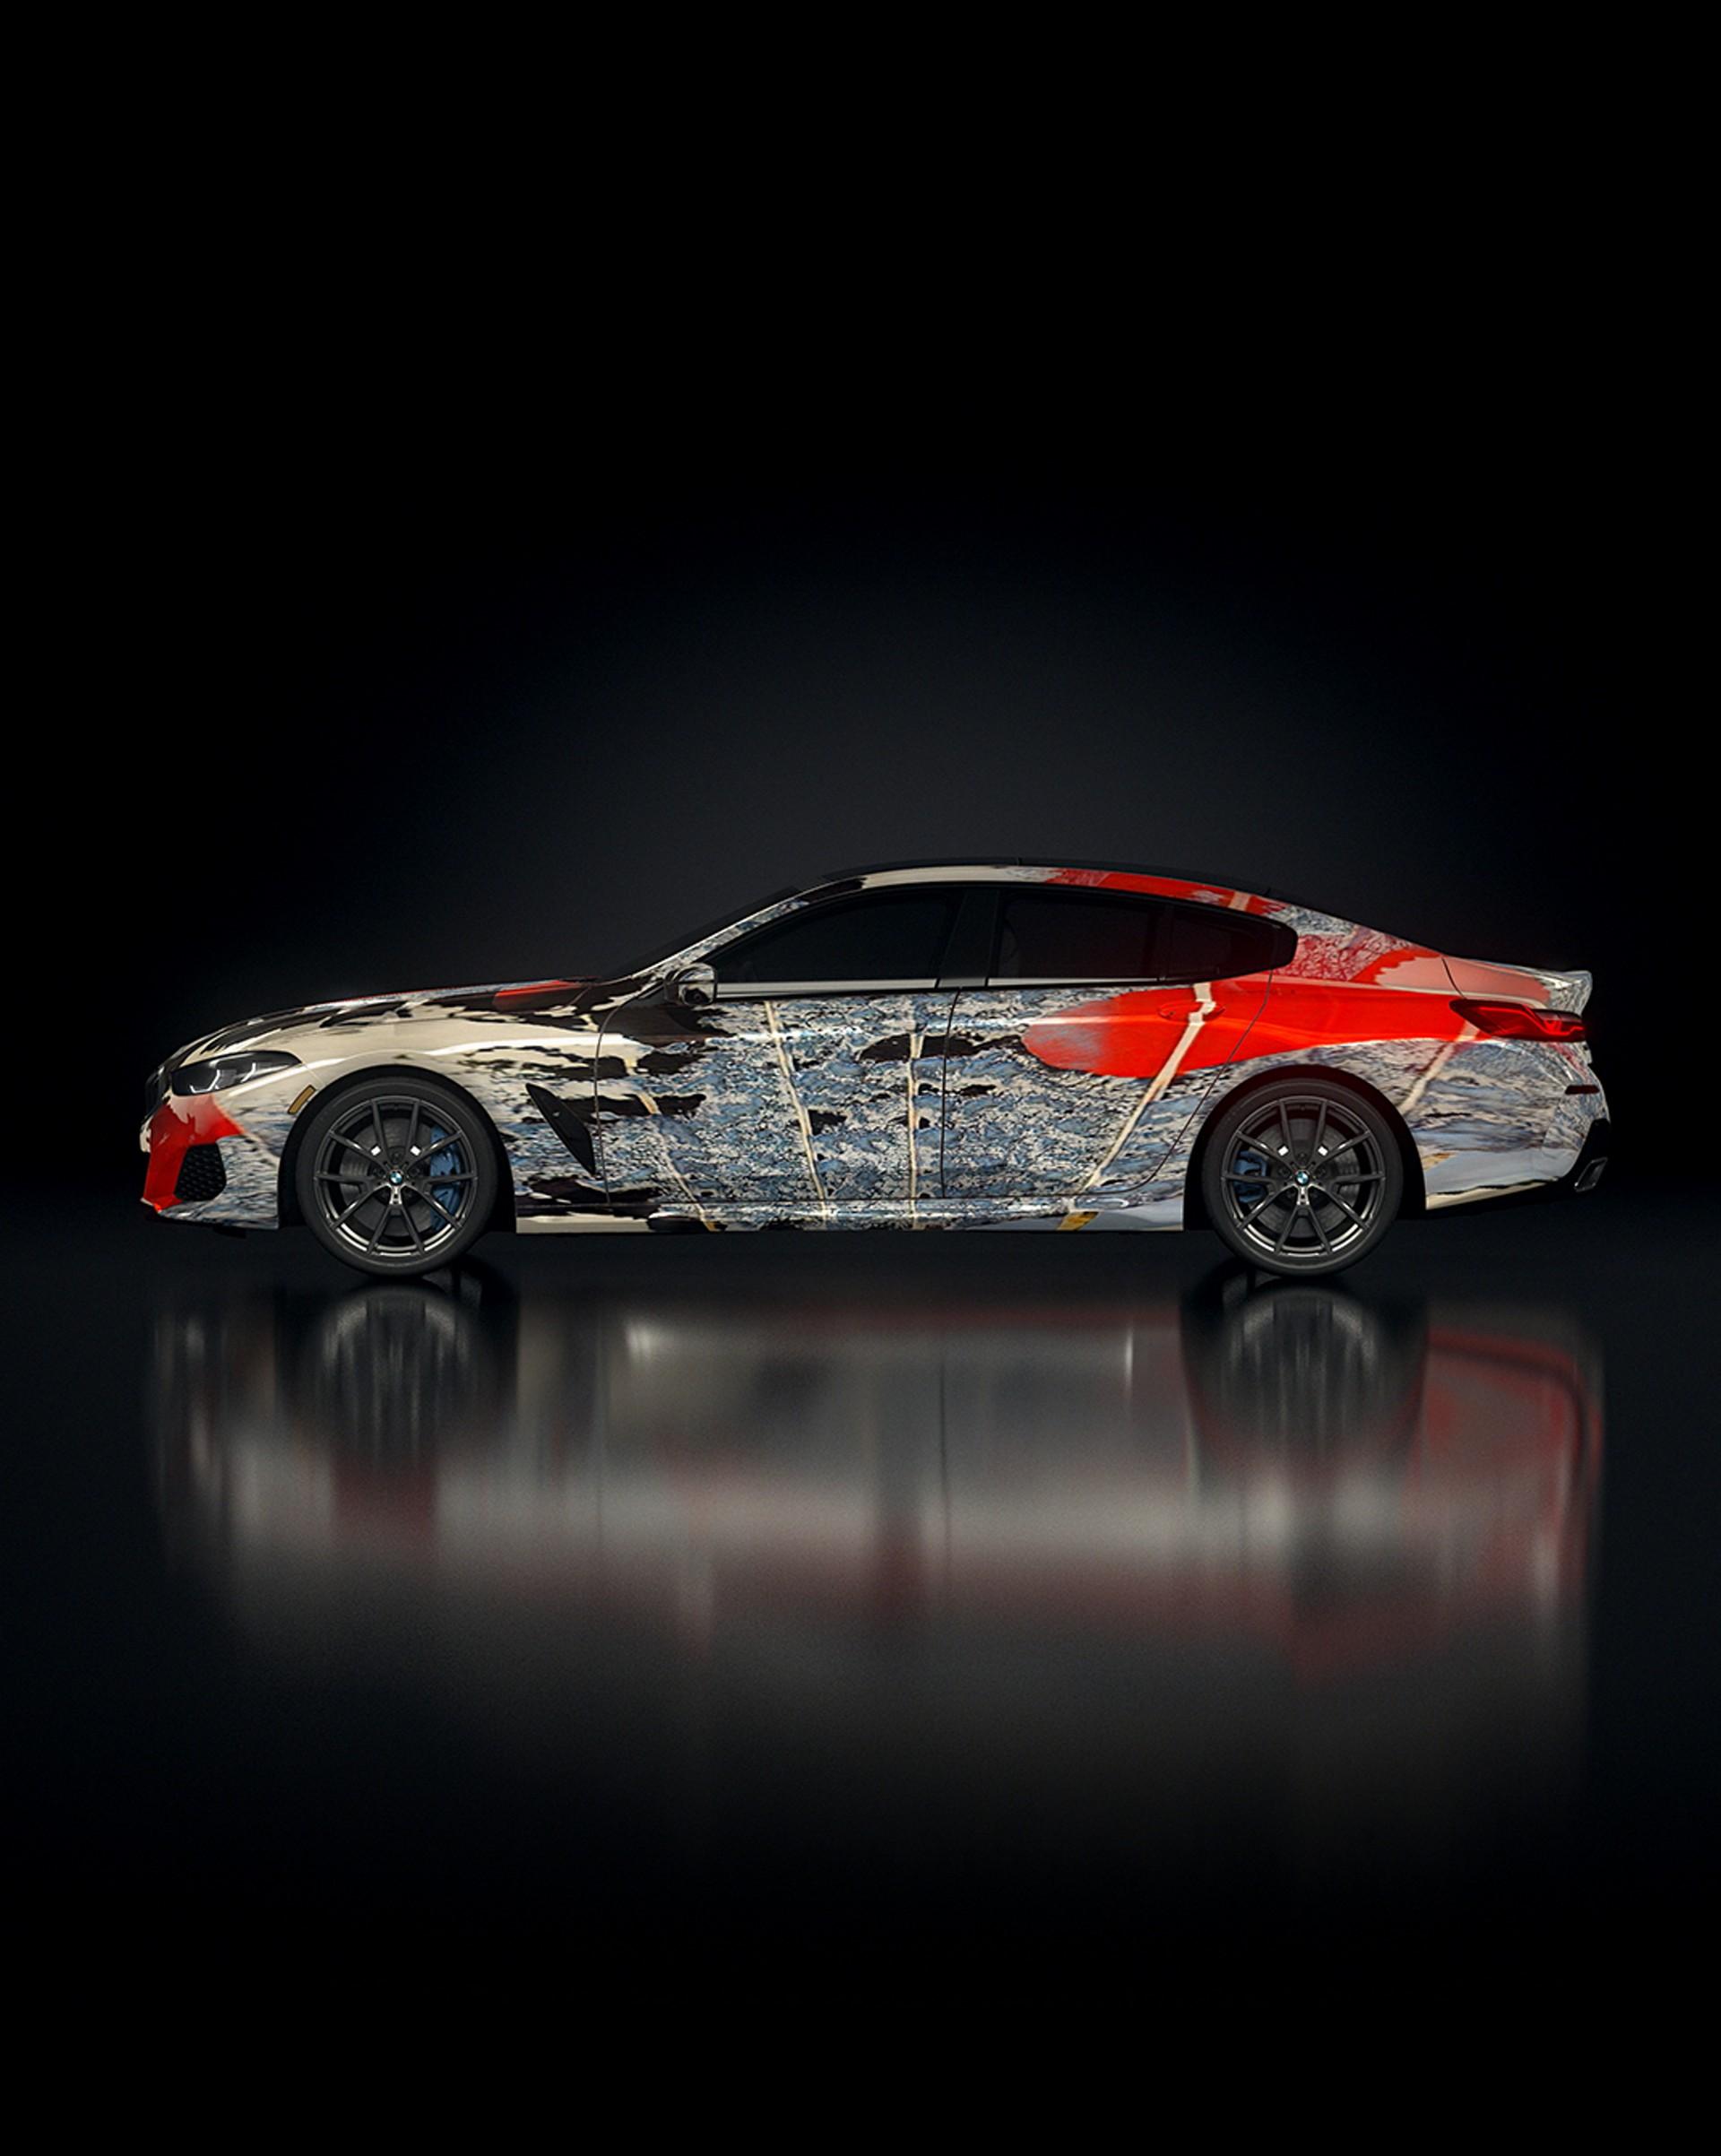 BMW-8-Series-Gran-Coupe-art-car-23